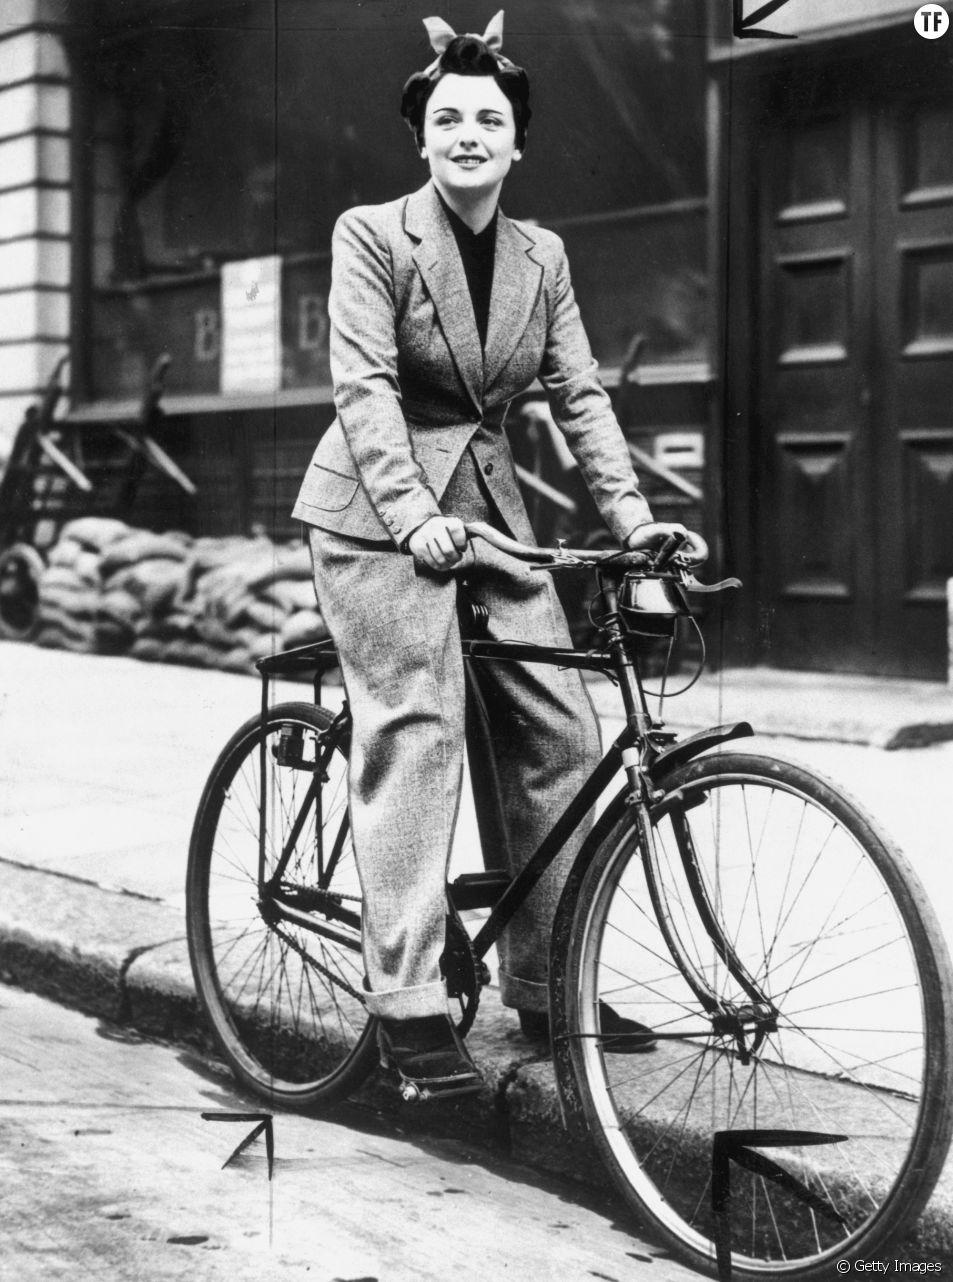 Femme en pantalon en 1939.